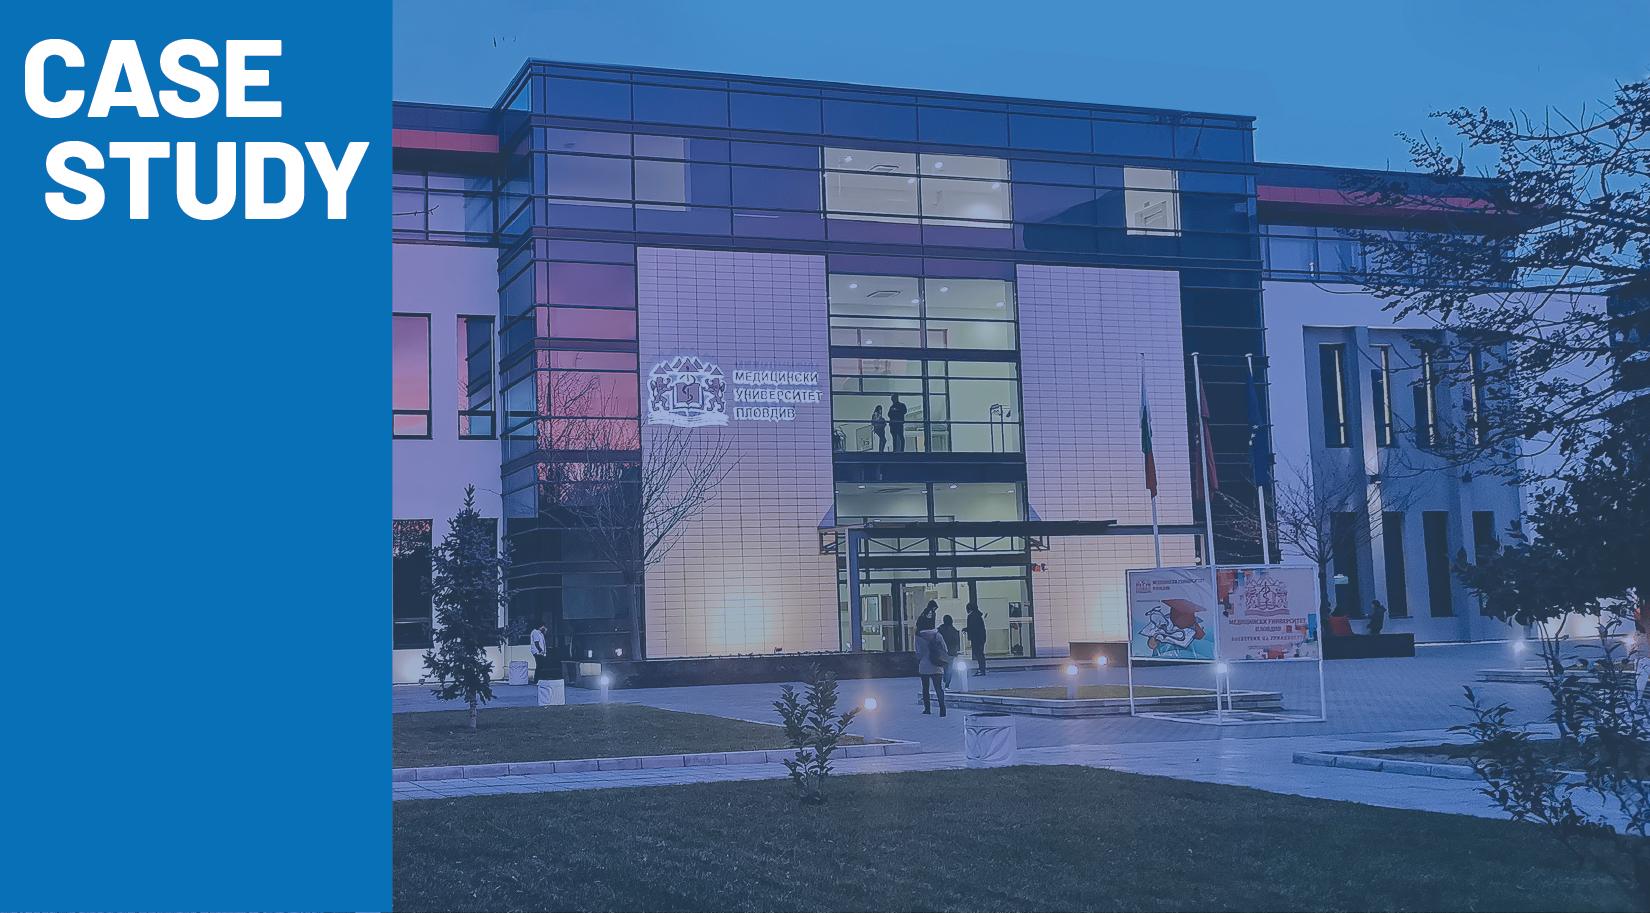 Leading Bulgarian university embraces a new way of providing digital education